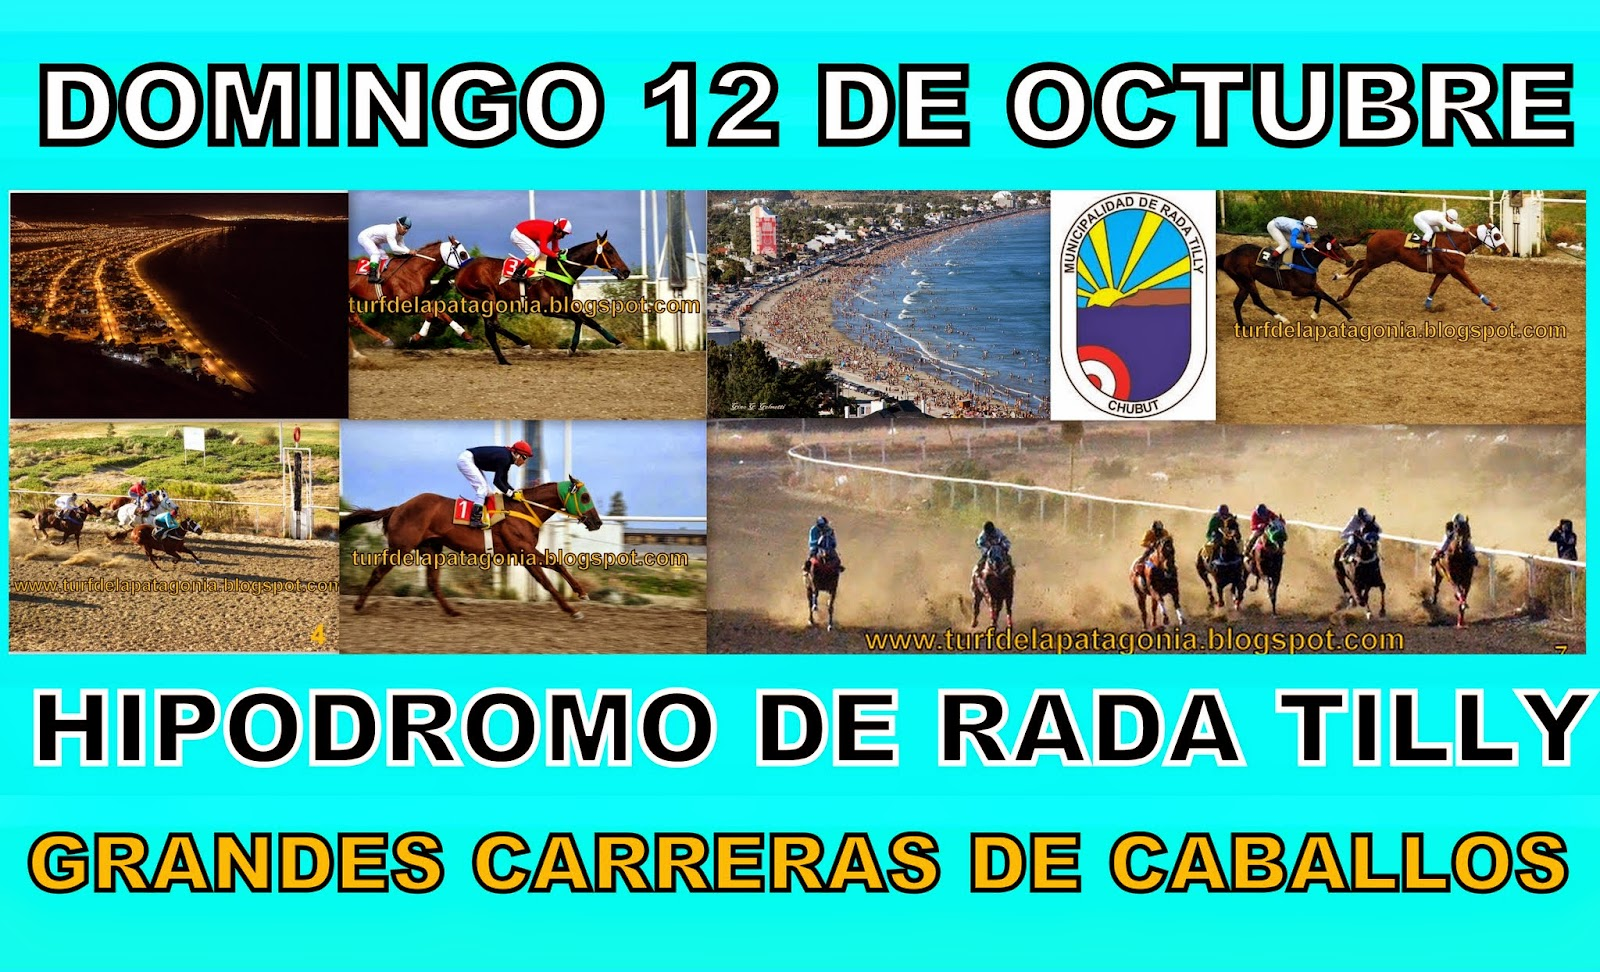 http://turfdelapatagonia.blogspot.com.ar/2014/10/1210-programa-de-carreras-de-caballos.html